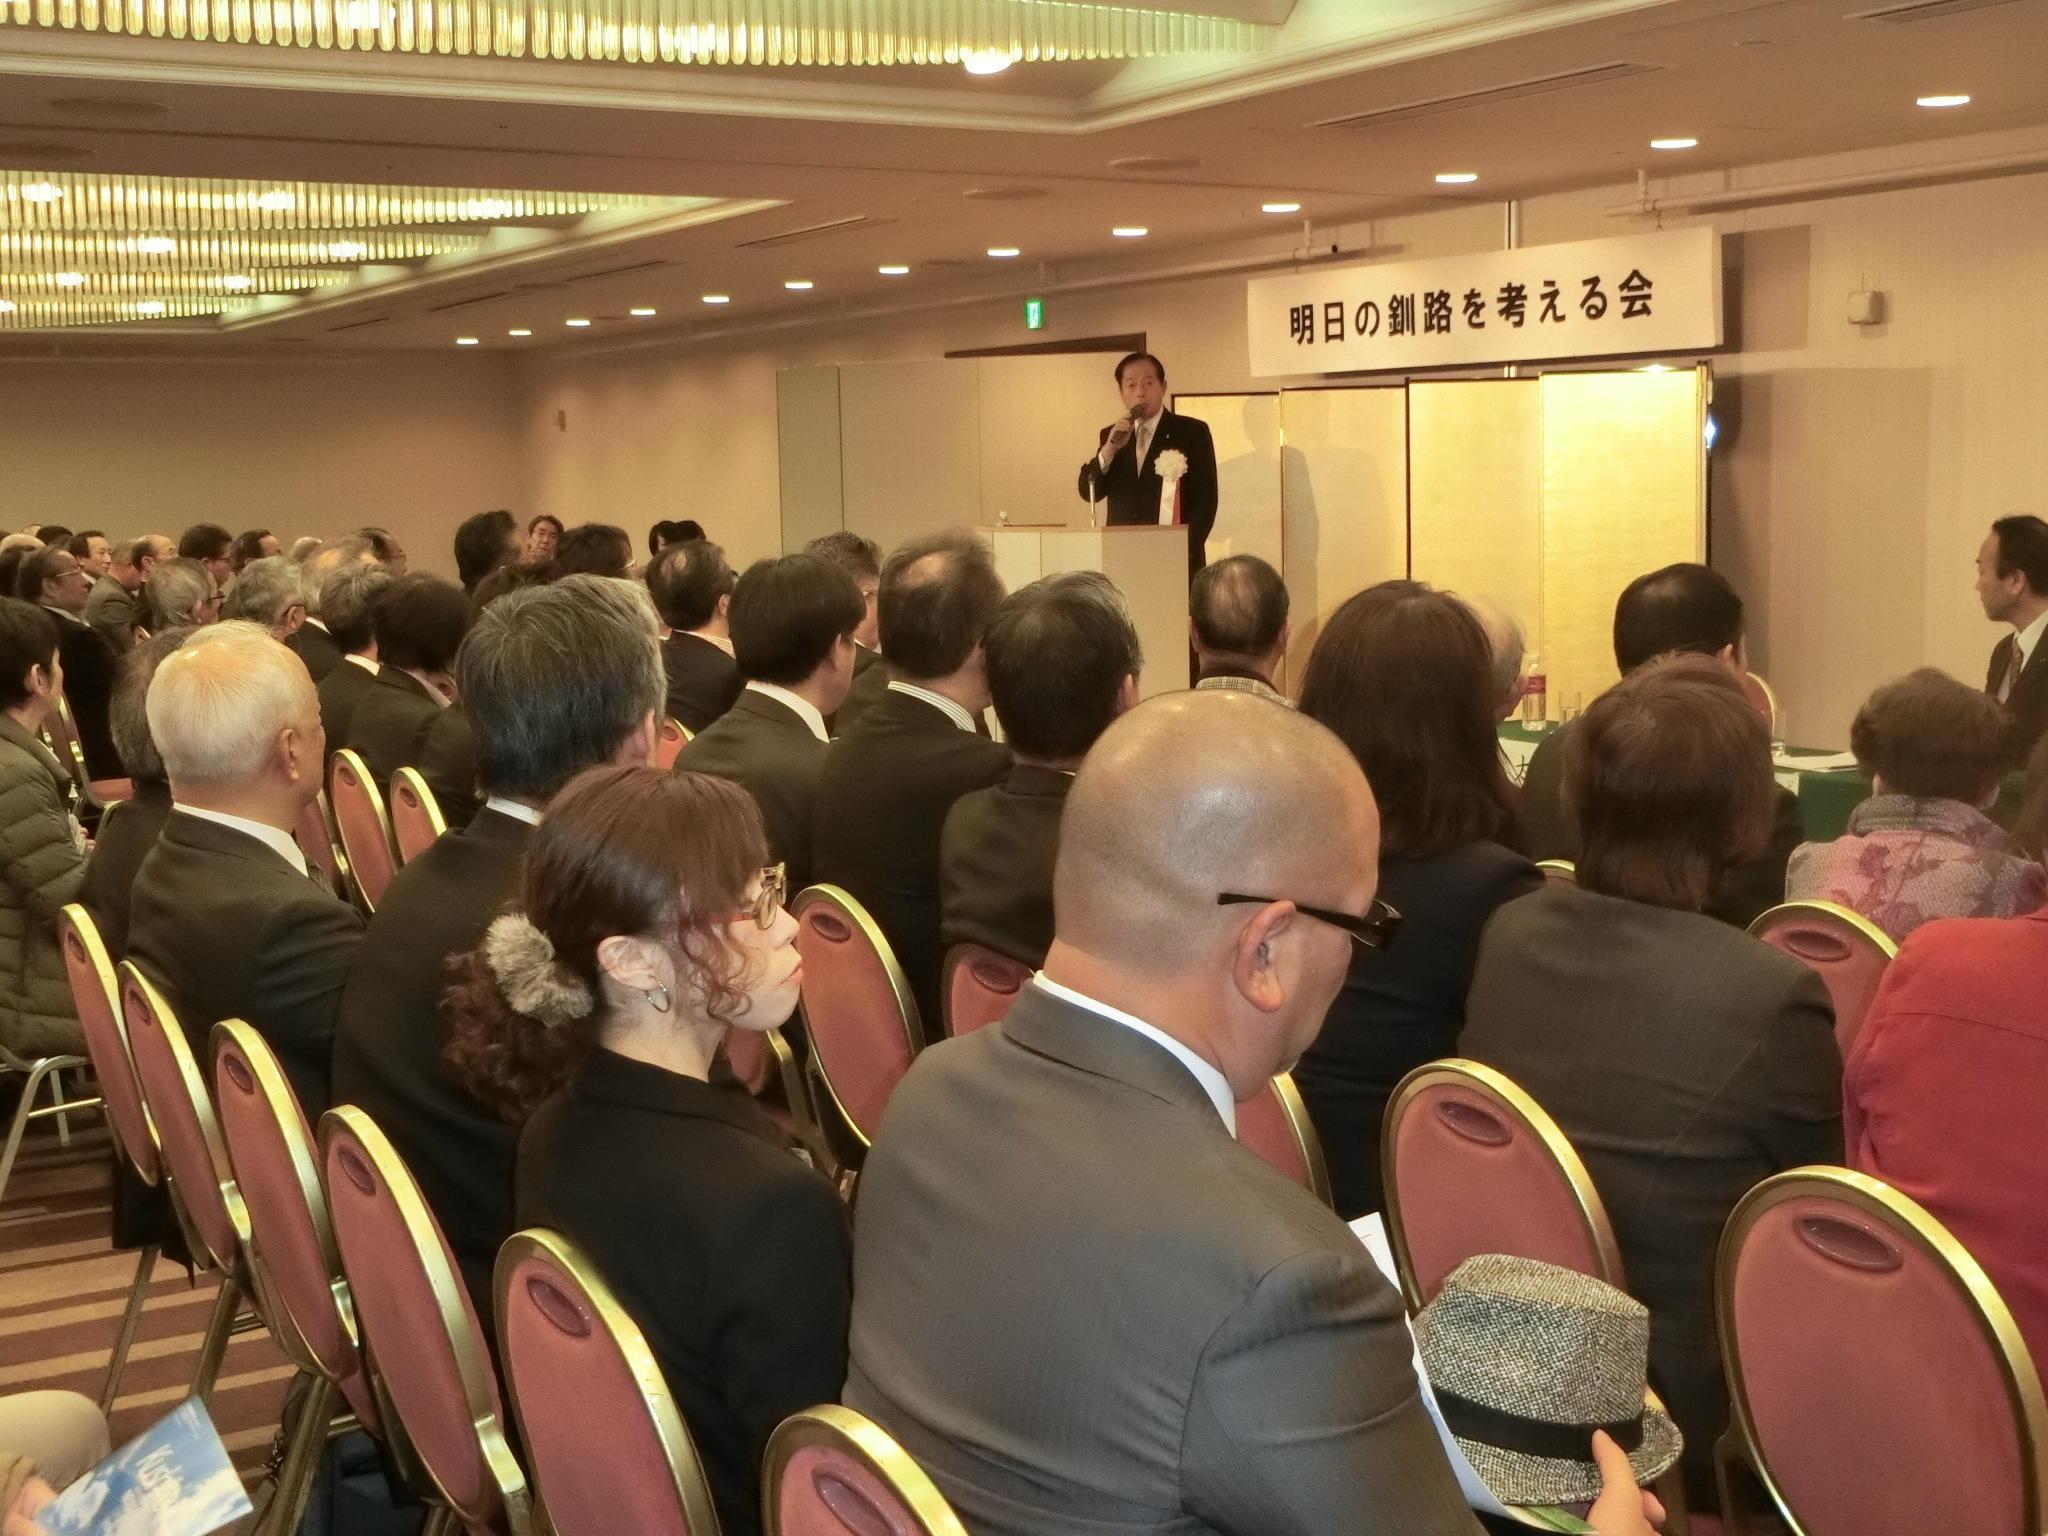 https://www.akihiro-ohta.com/blog/20181124161219-3.jpg